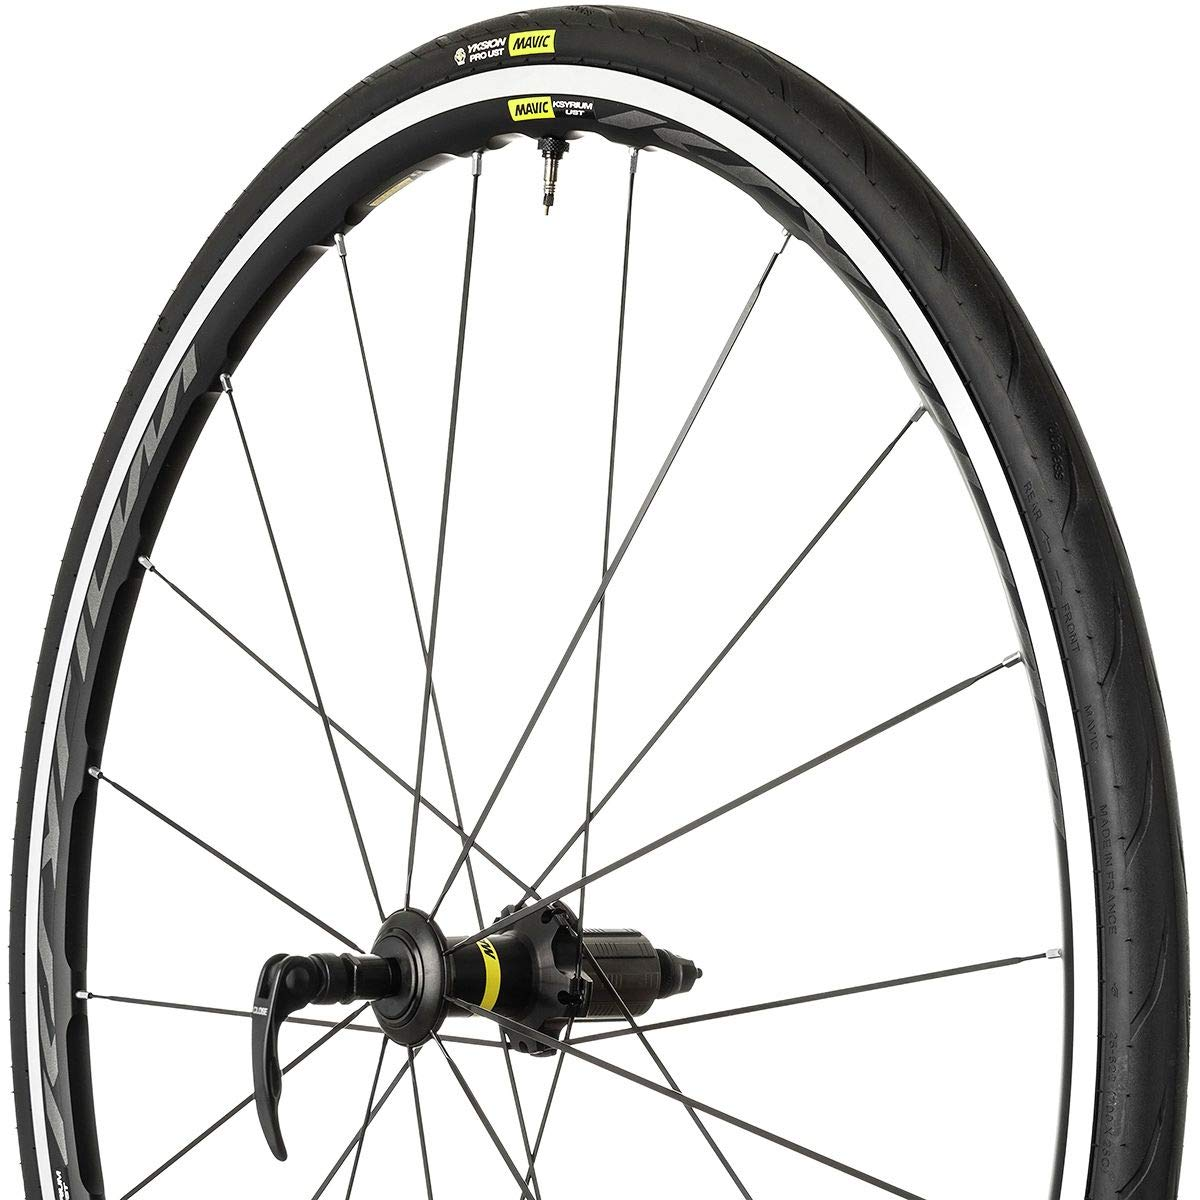 Mavic Ksyrium UST WTS Wheel Black, Front by Mavic